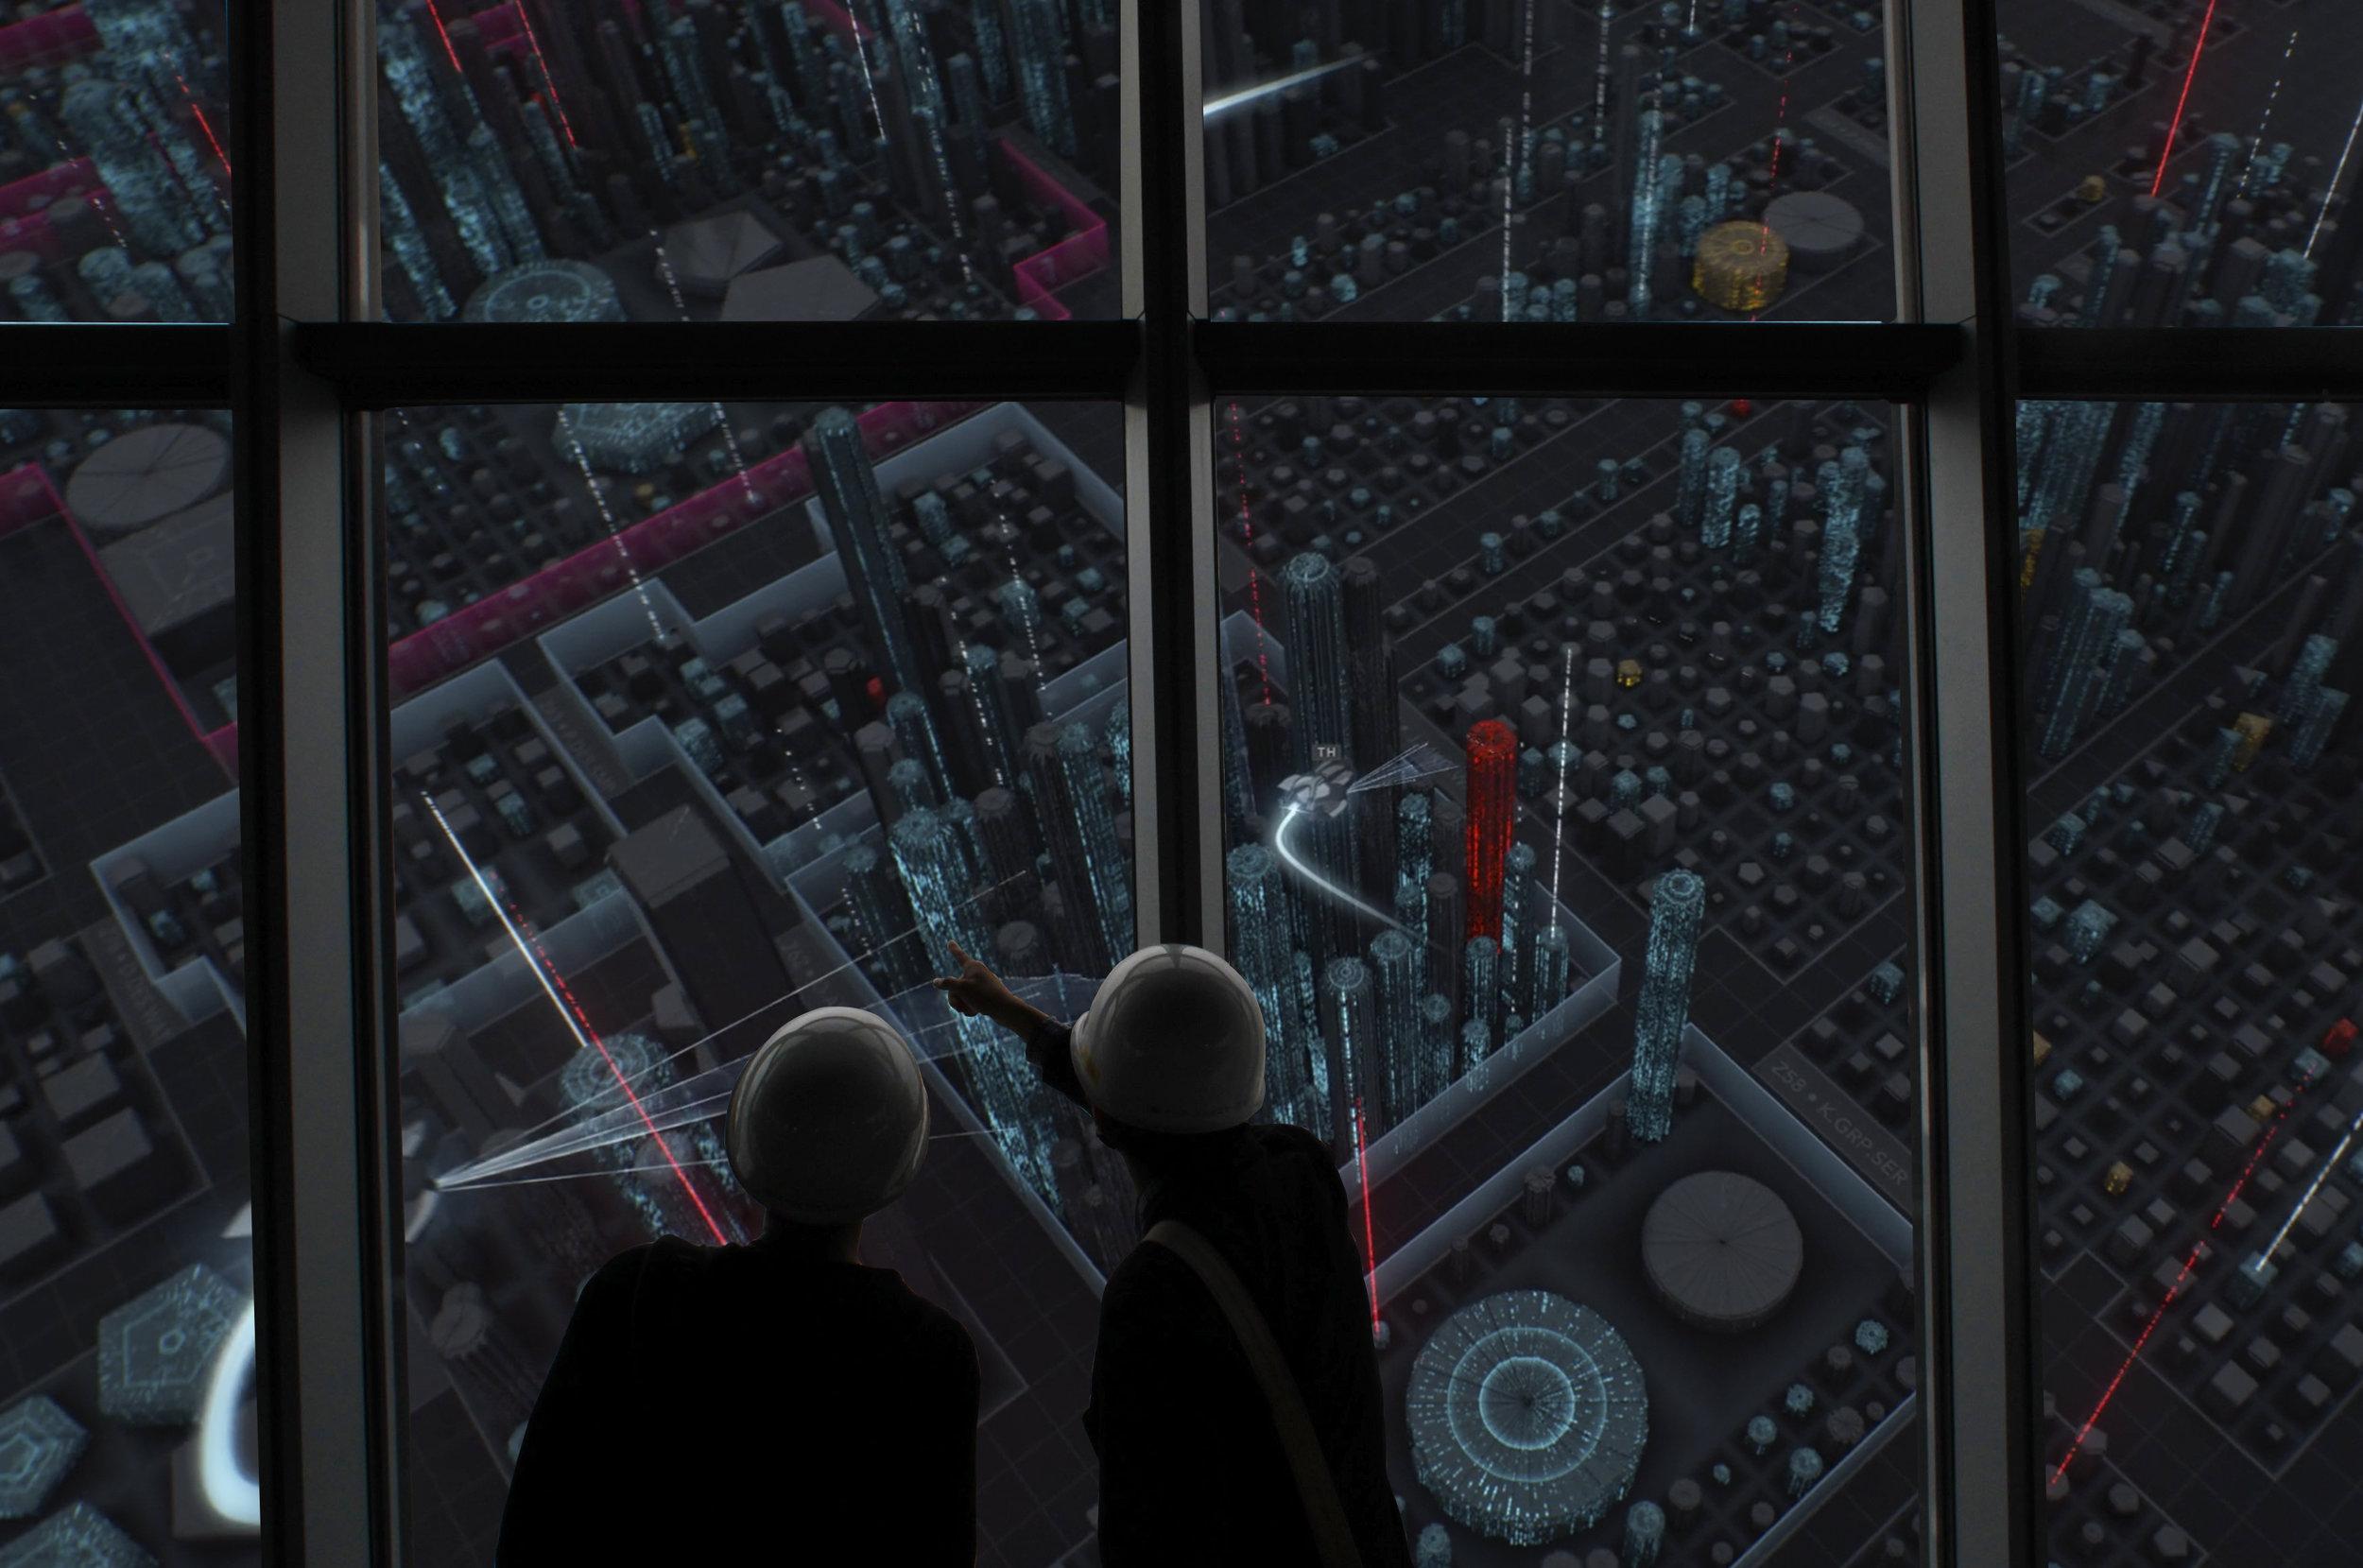 window-view.jpg